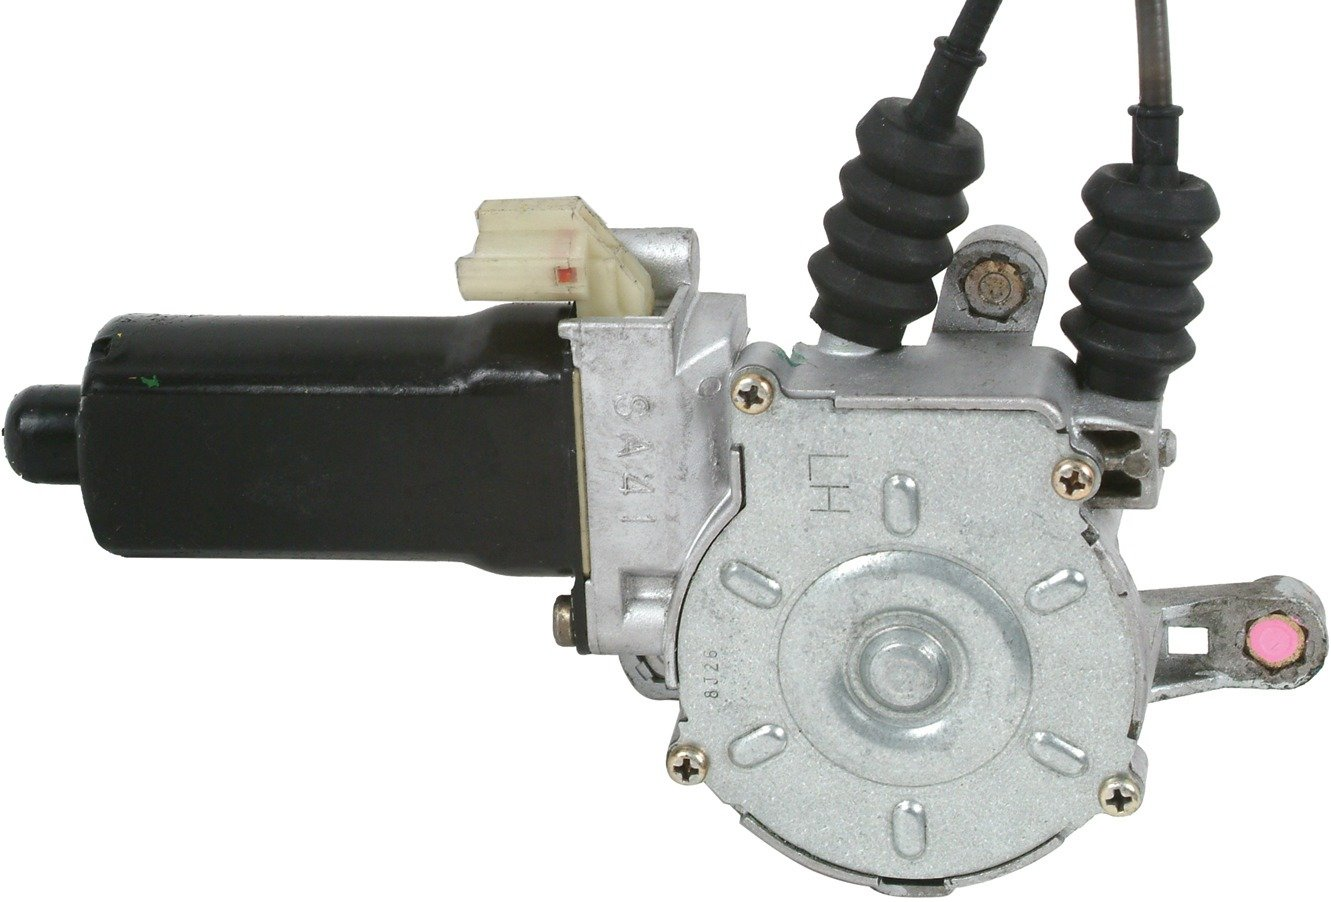 Cardone 47-4506R Remanufactured Import Window Lift Motor A1 Cardone A147-4506R